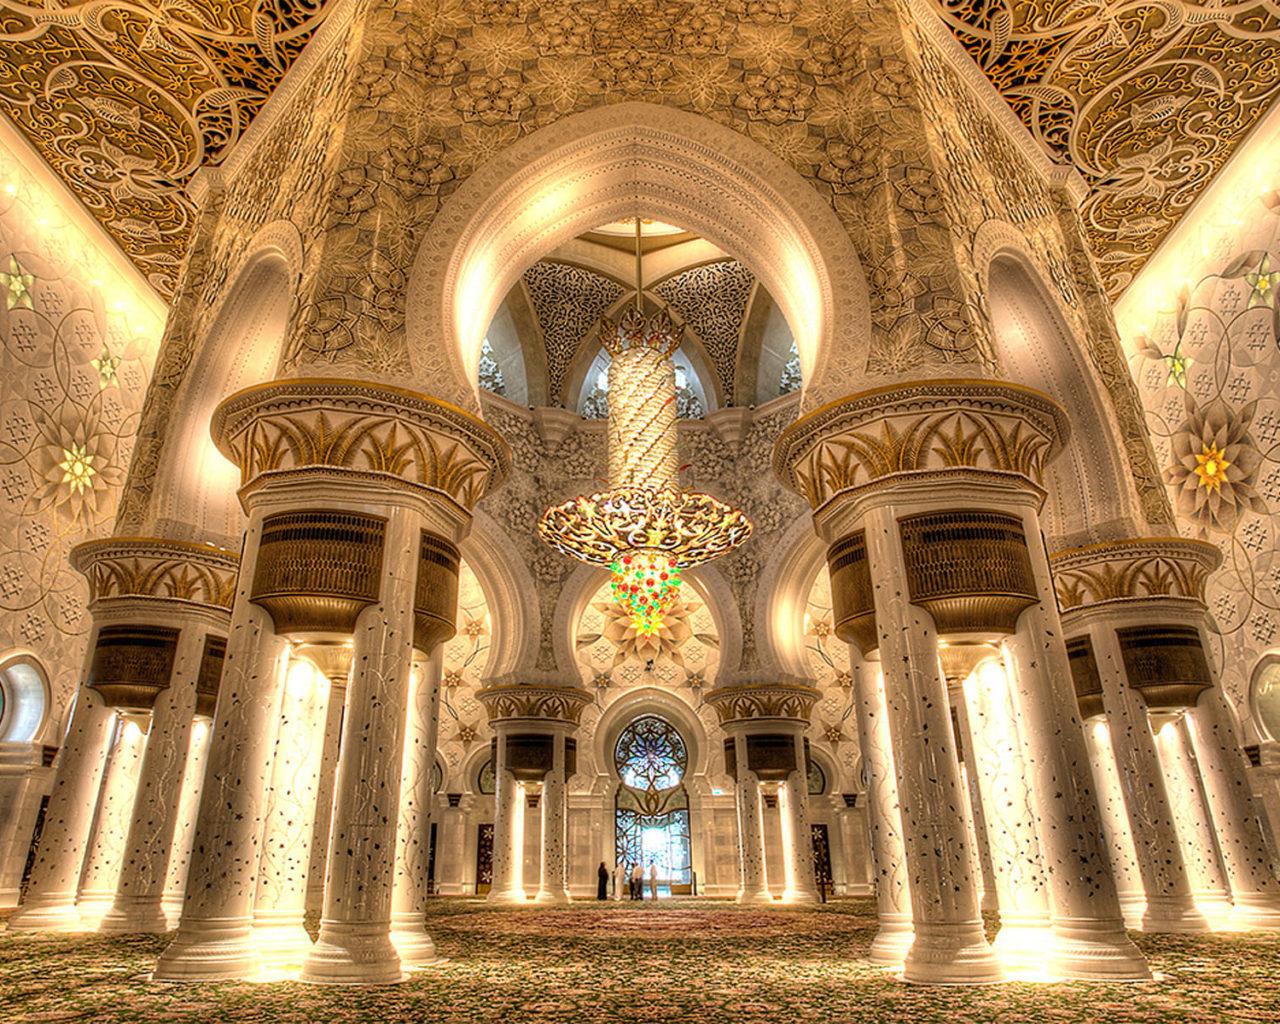 Inside Of Iphone X Wallpaper Grand Mosque Sheikh Zayed Abu Dhabi Interior Design Main